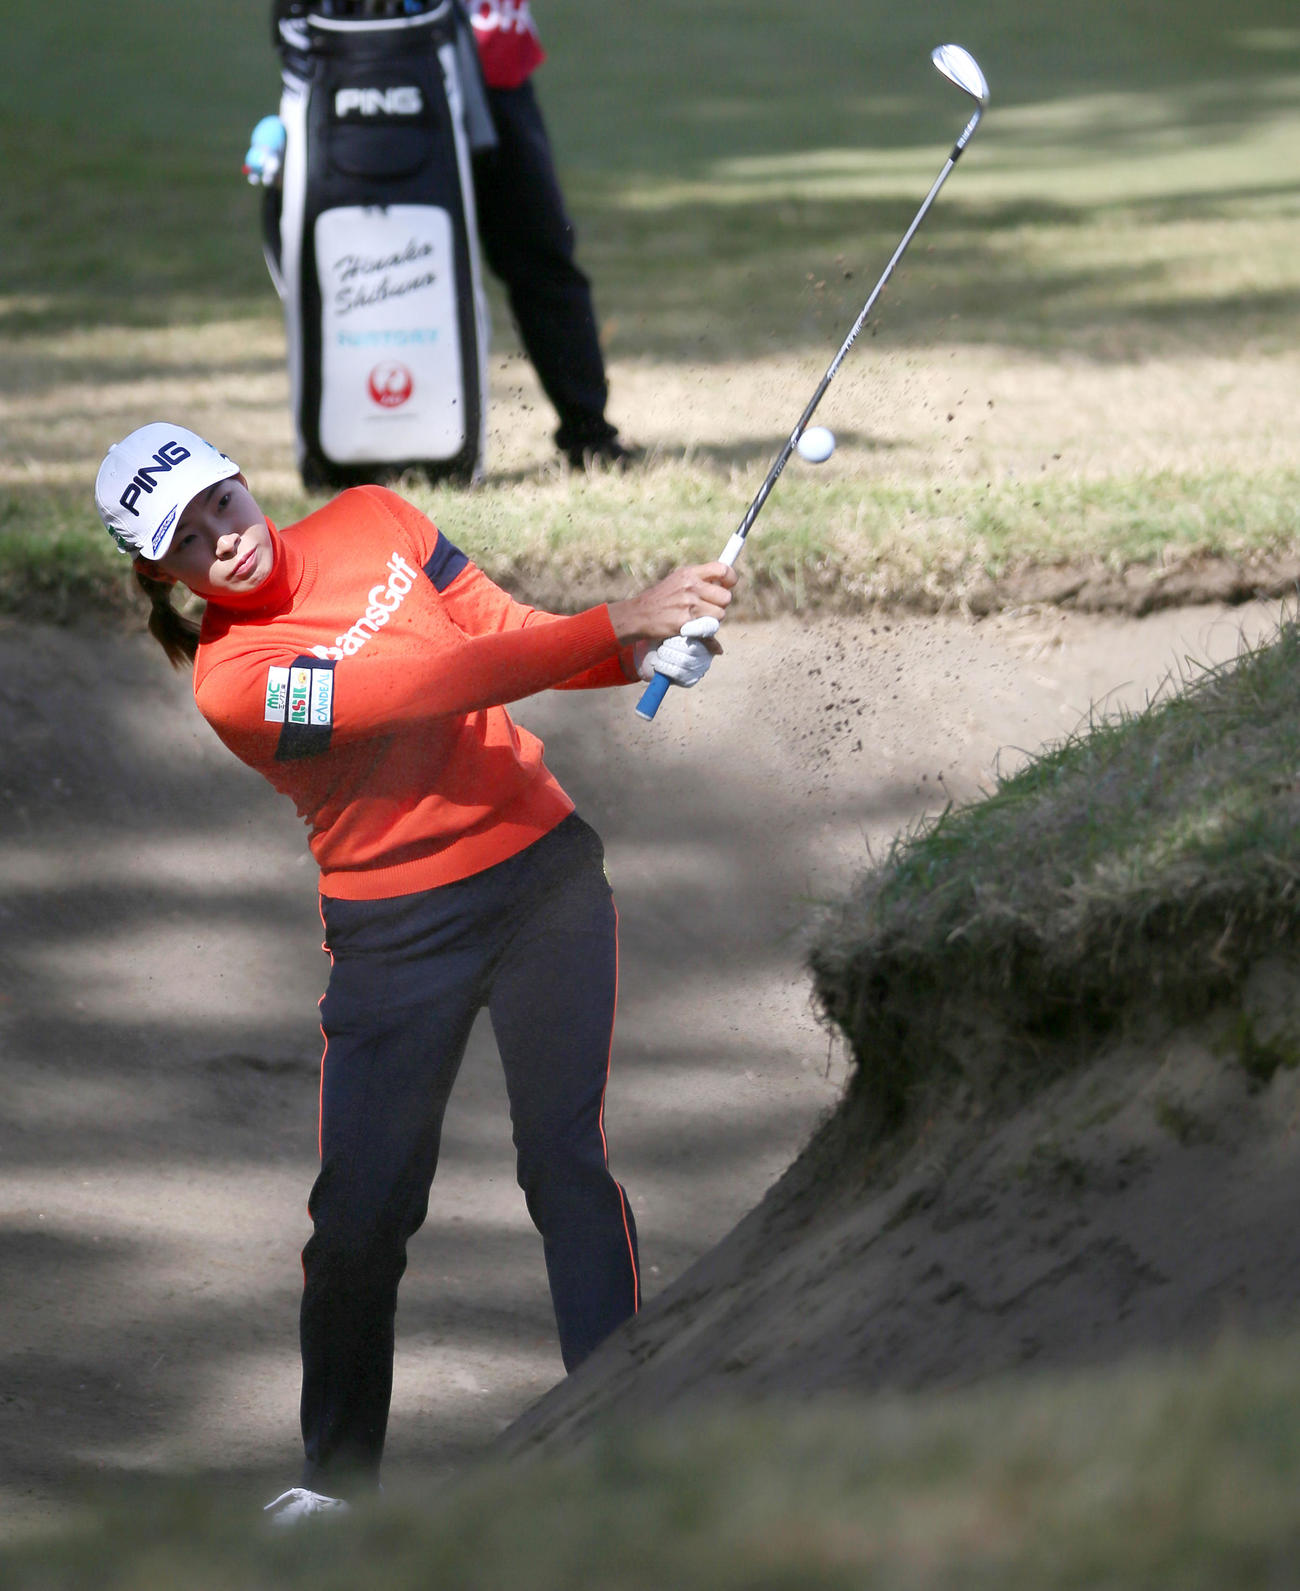 https://www.nikkansports.com/sports/golf/news/img/202011280000603-w1300_2.jpg